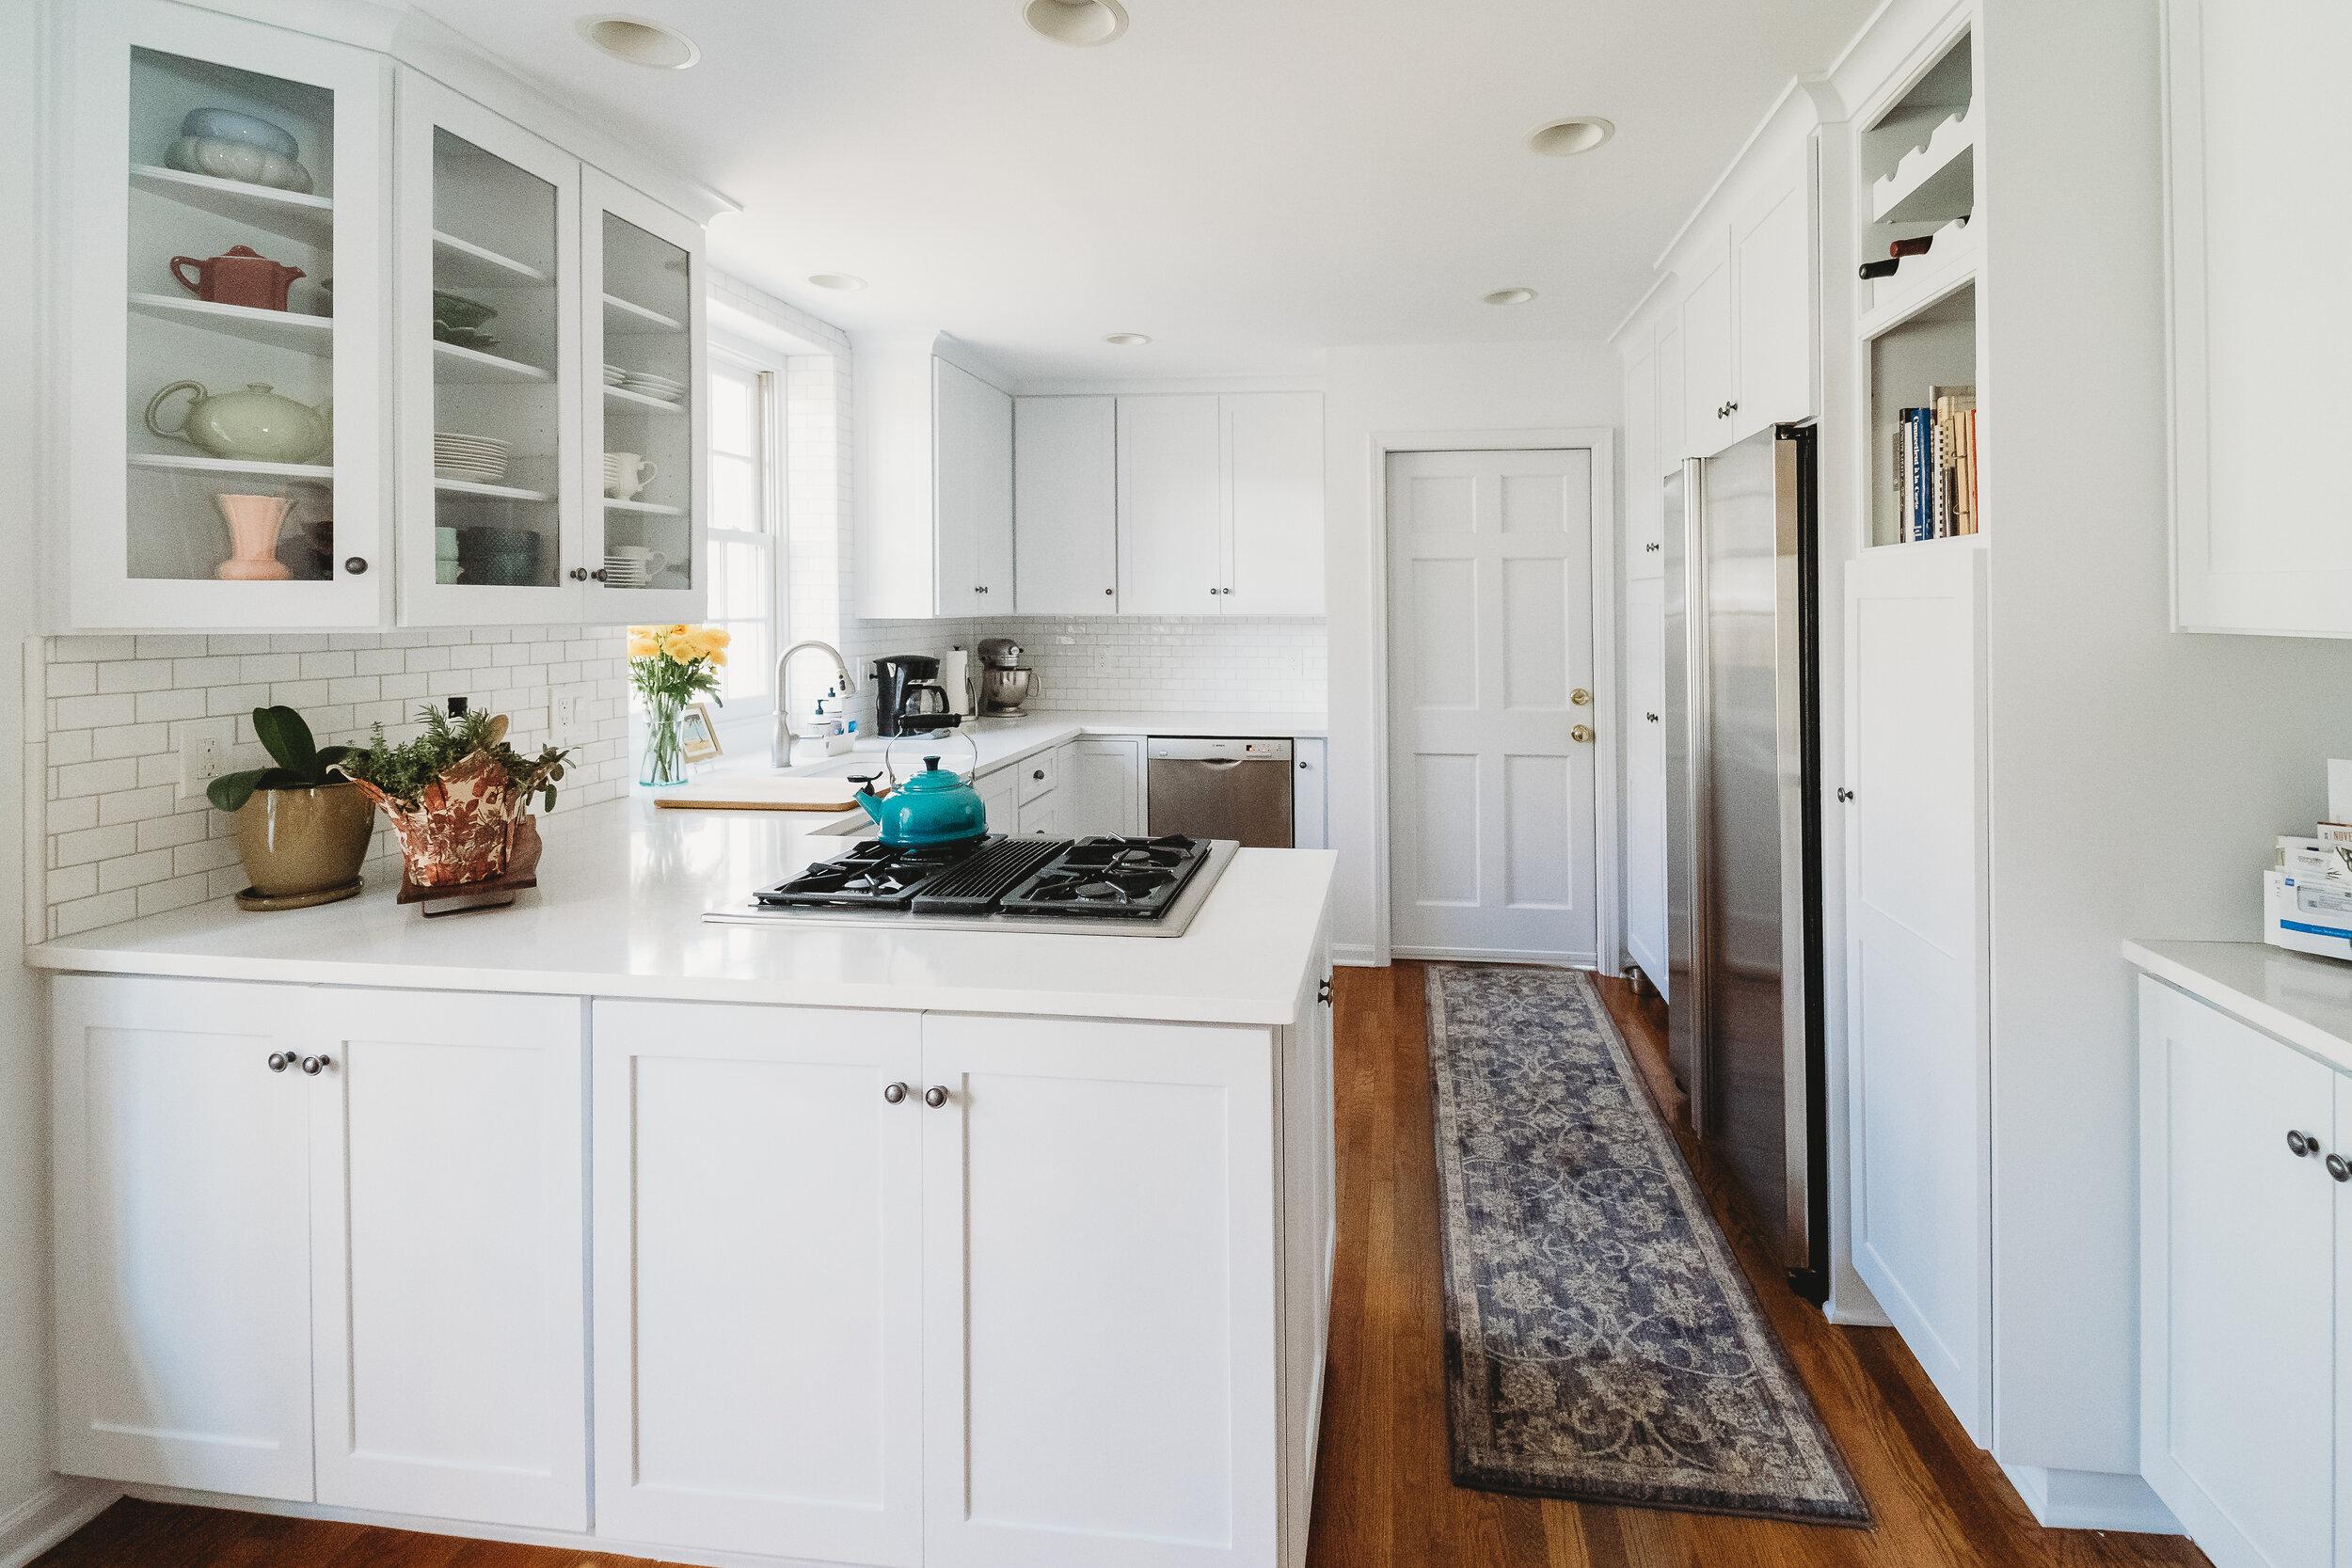 gripka_construction_leawood_kansas_kitchen_remodel-2.jpg